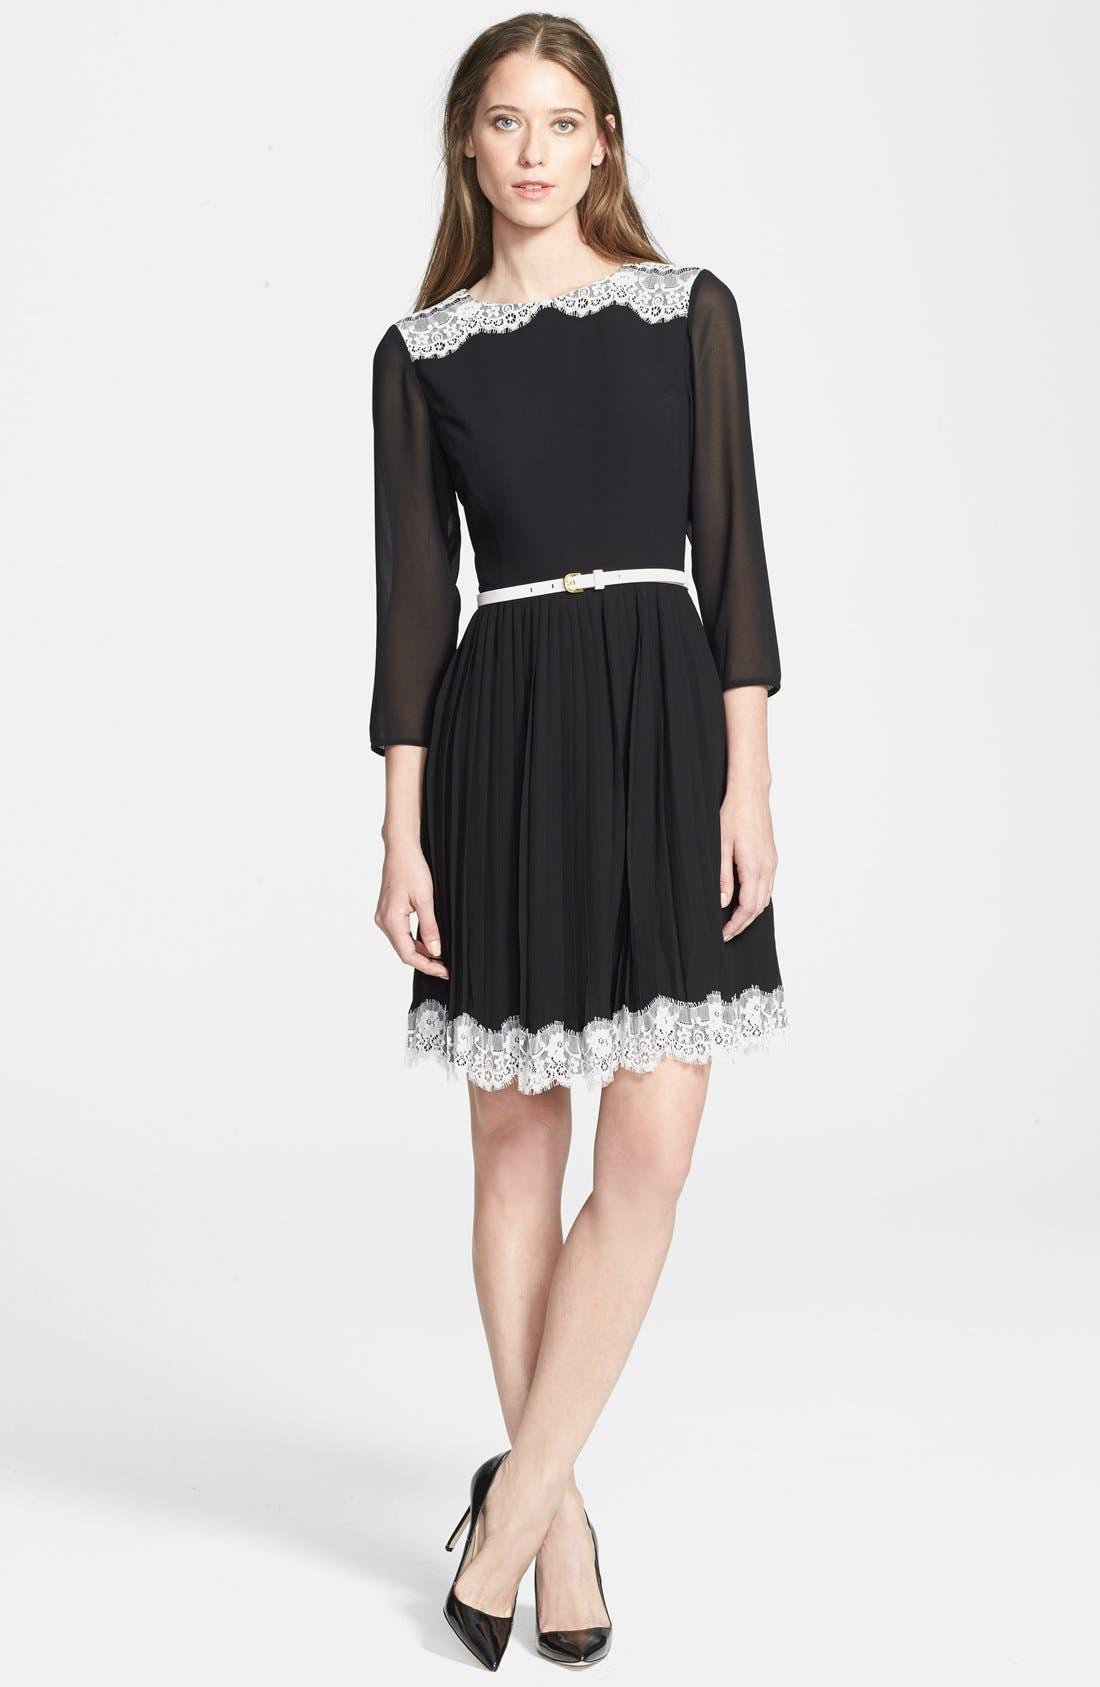 Main Image - Ted Baker London 'Olivhia' Lace Detail A-Line Dress